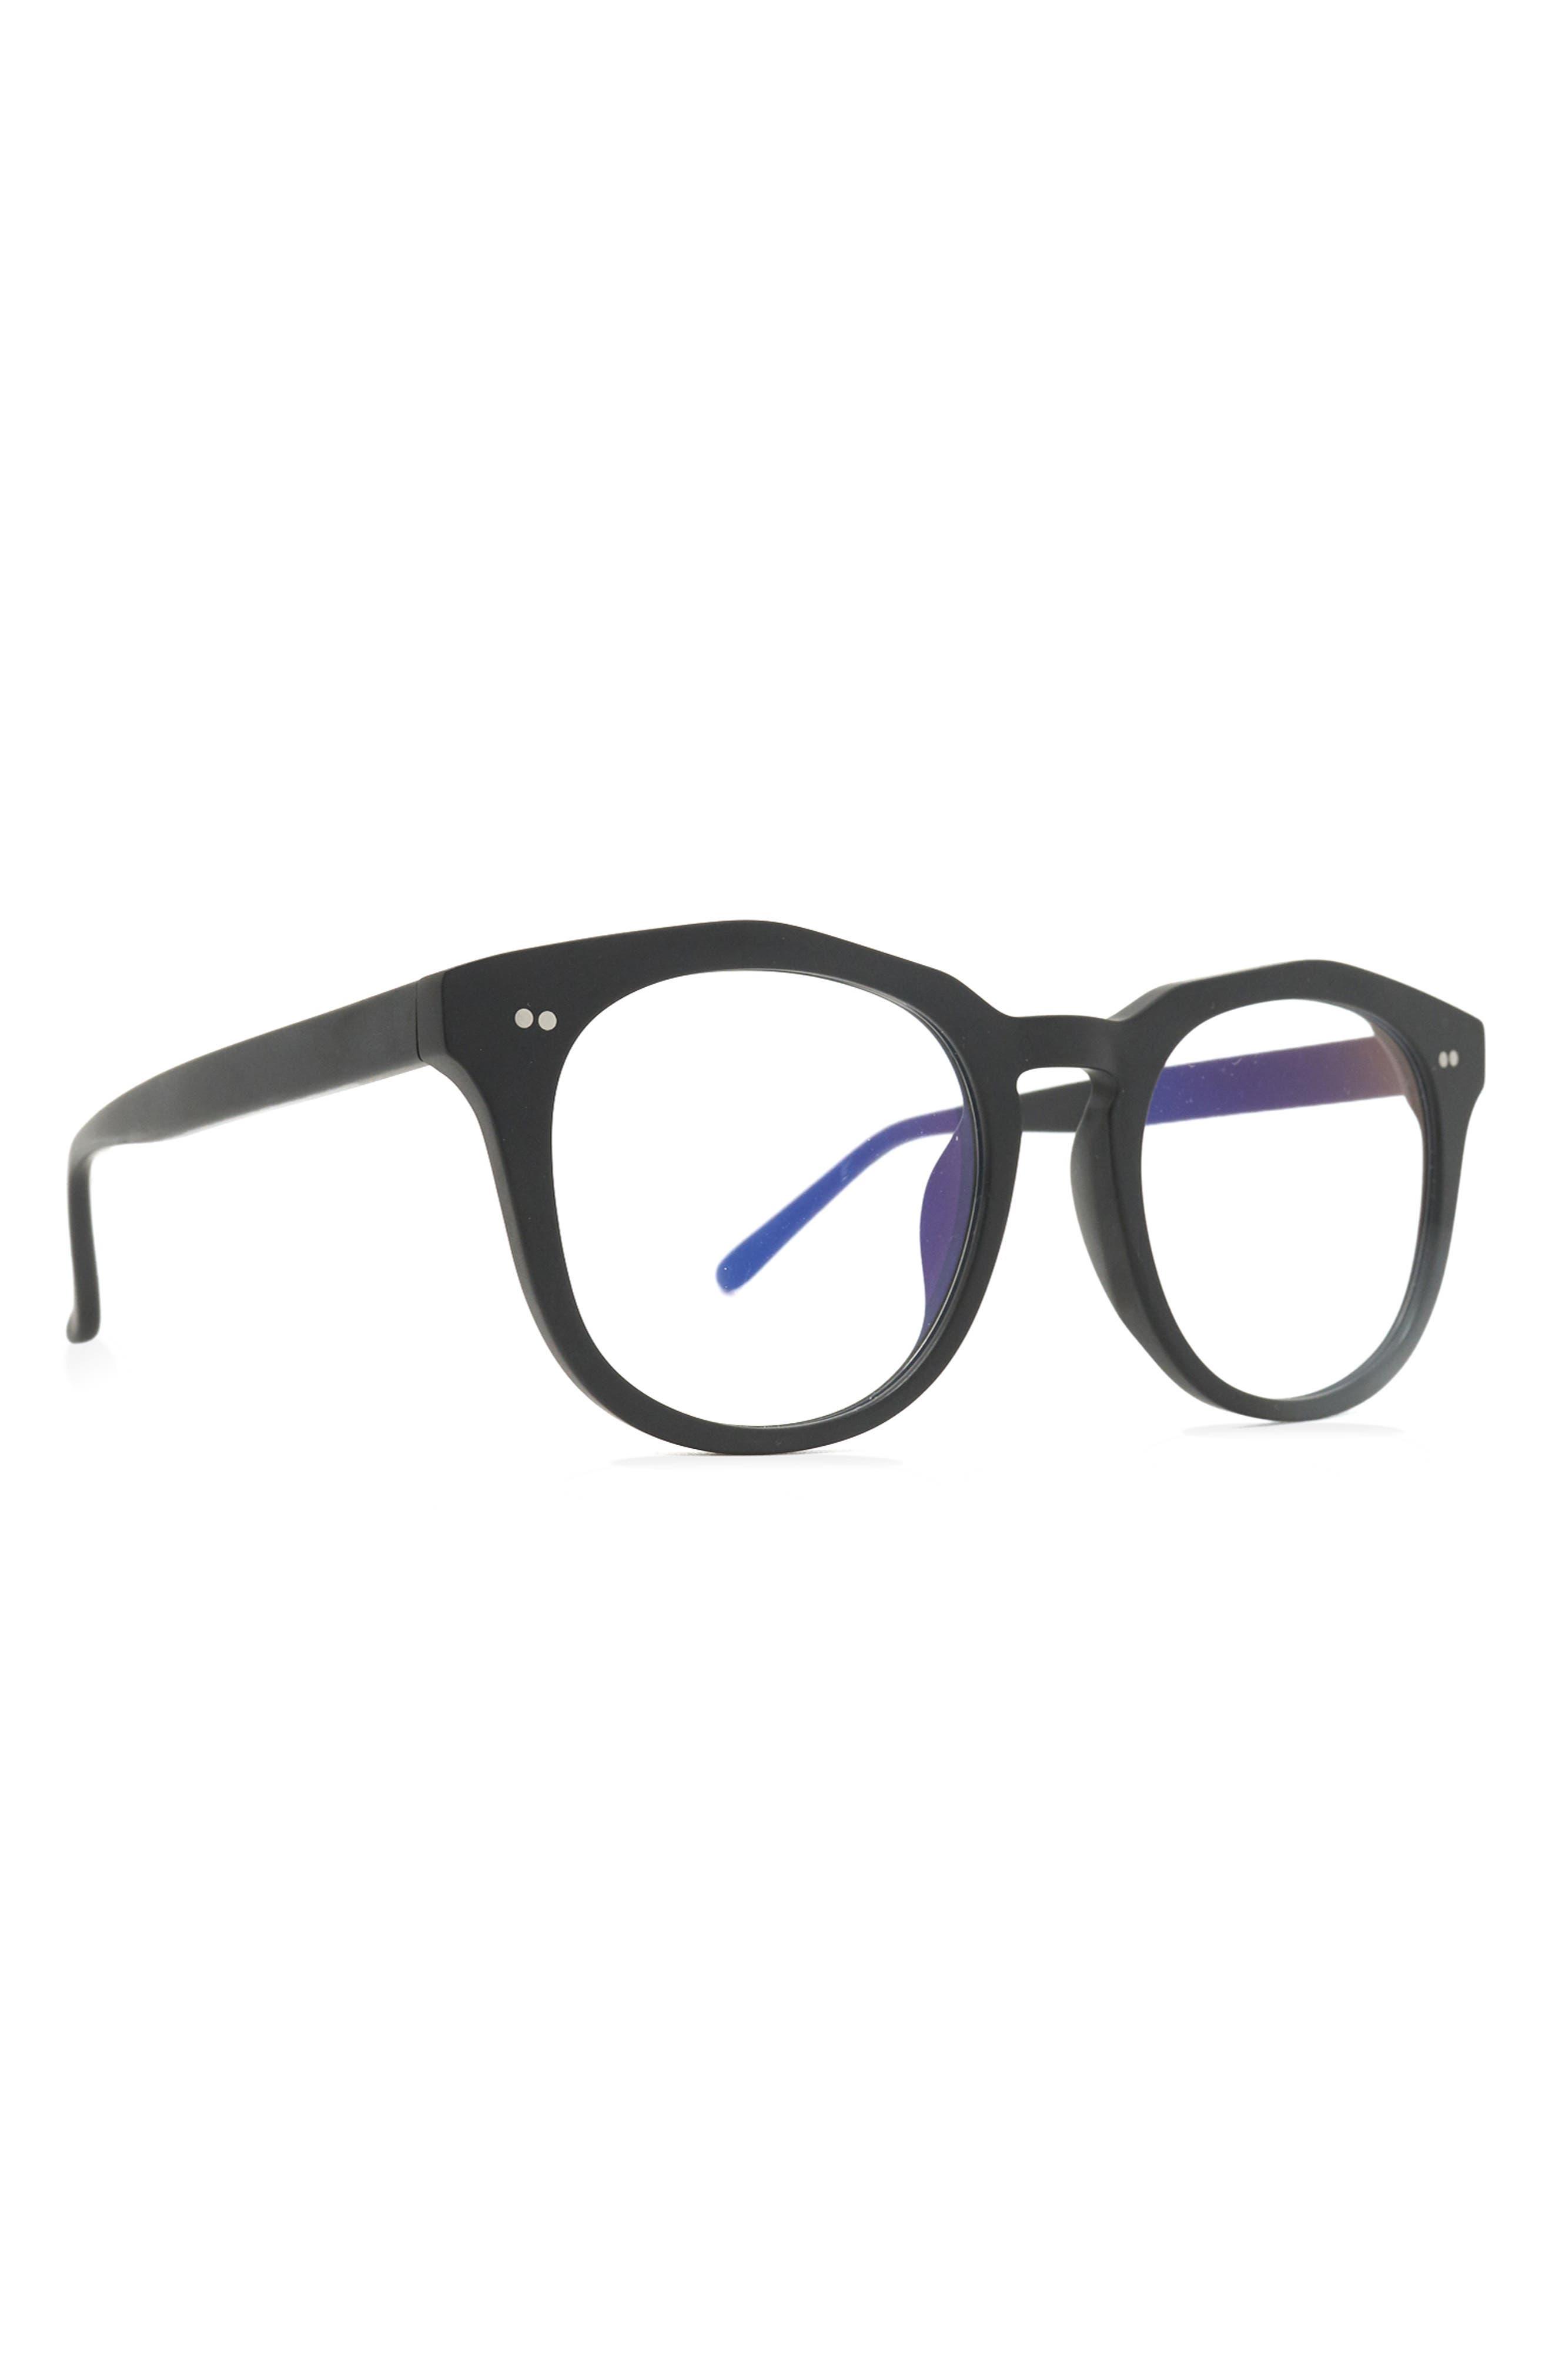 50mm Blue Light Blocking Round Glasses